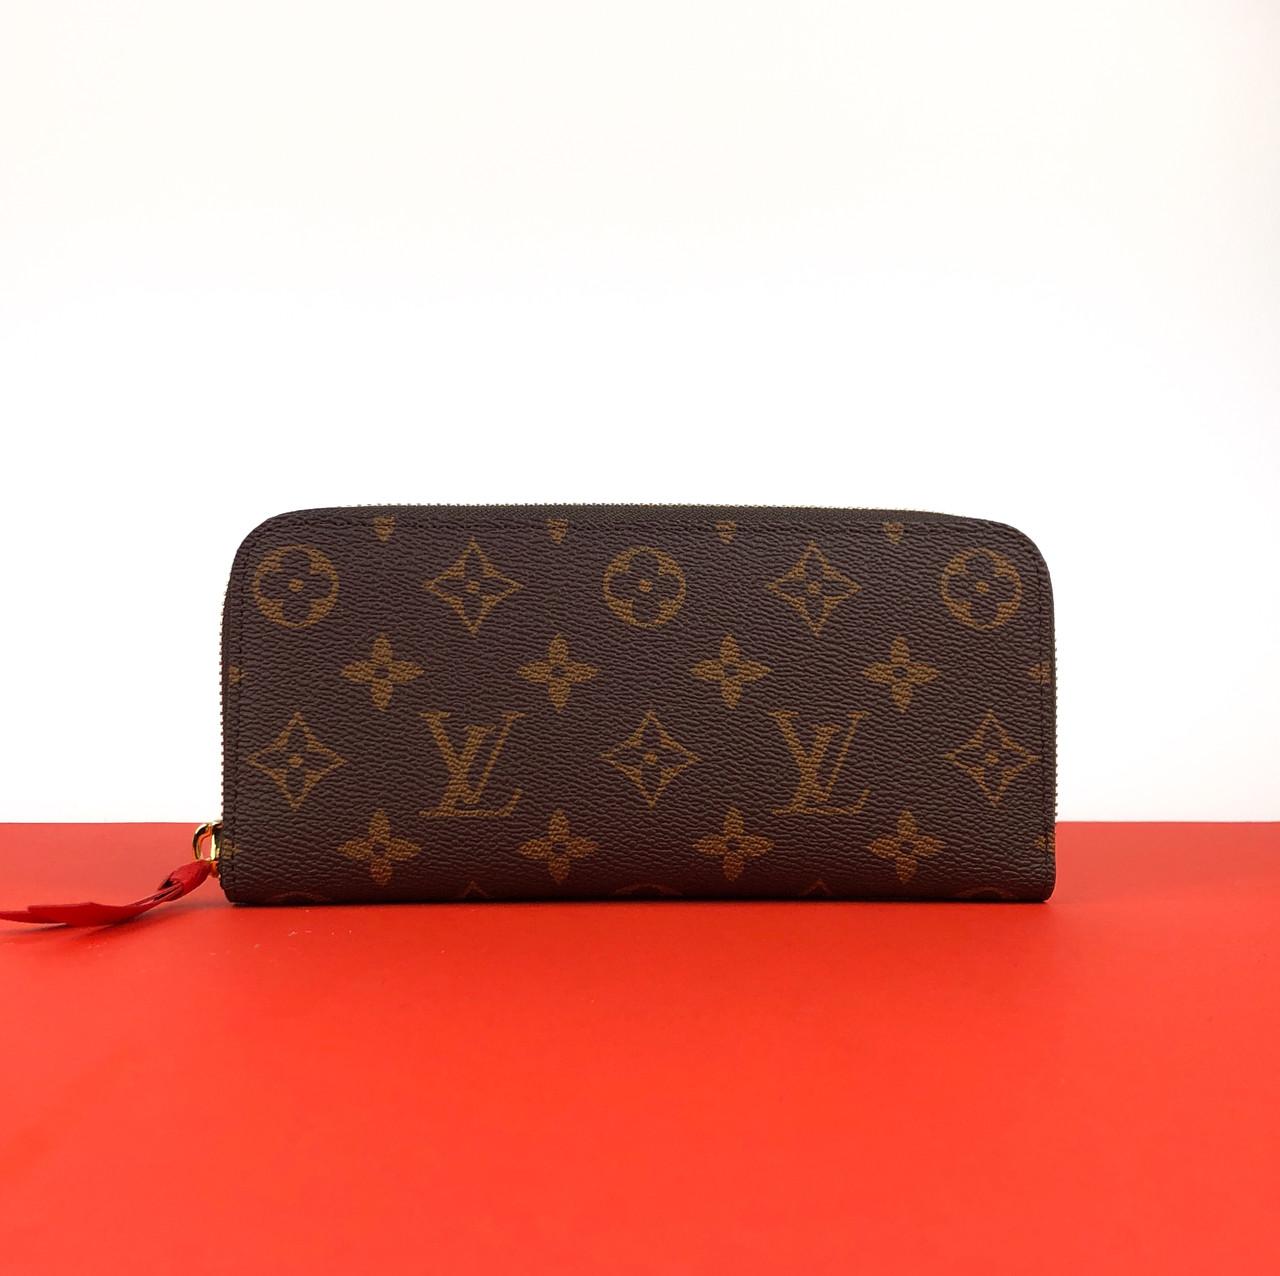 Кошелек Louis Vuitton Clémence красный (Луи Виттон) арт. 22-03